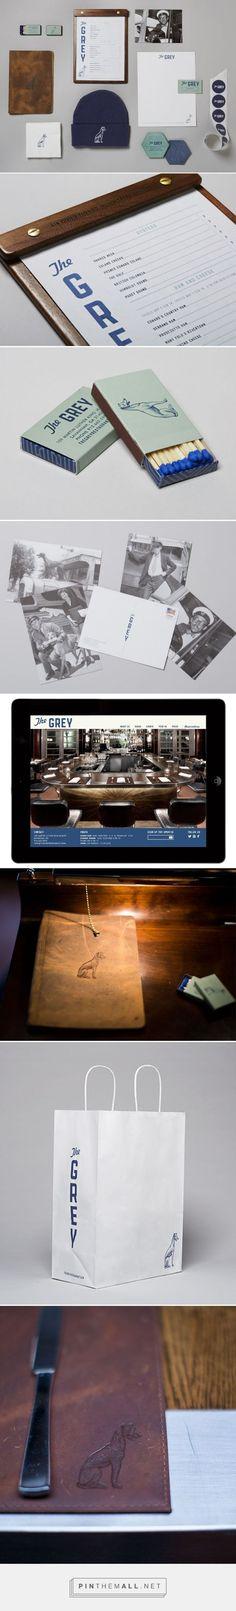 The Grey Restaurant Branding by LMNOP Creative | Fivestar Branding – Design and Branding Agency & Inspiration Gallery